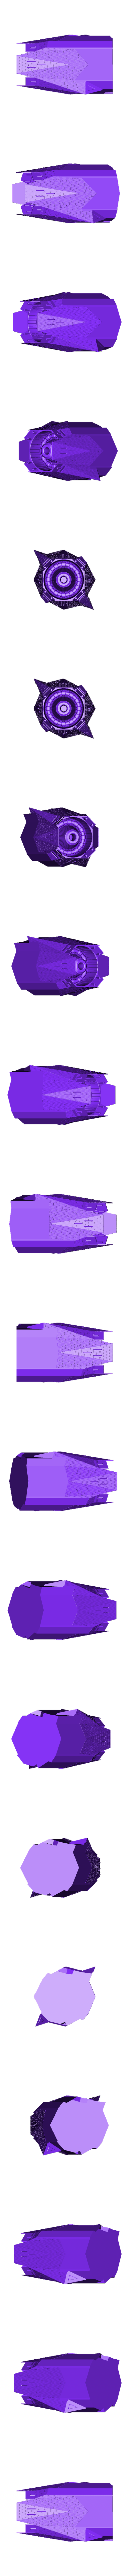 04.Engine.stl Download STL file Anubis • 3D print template, sergusy